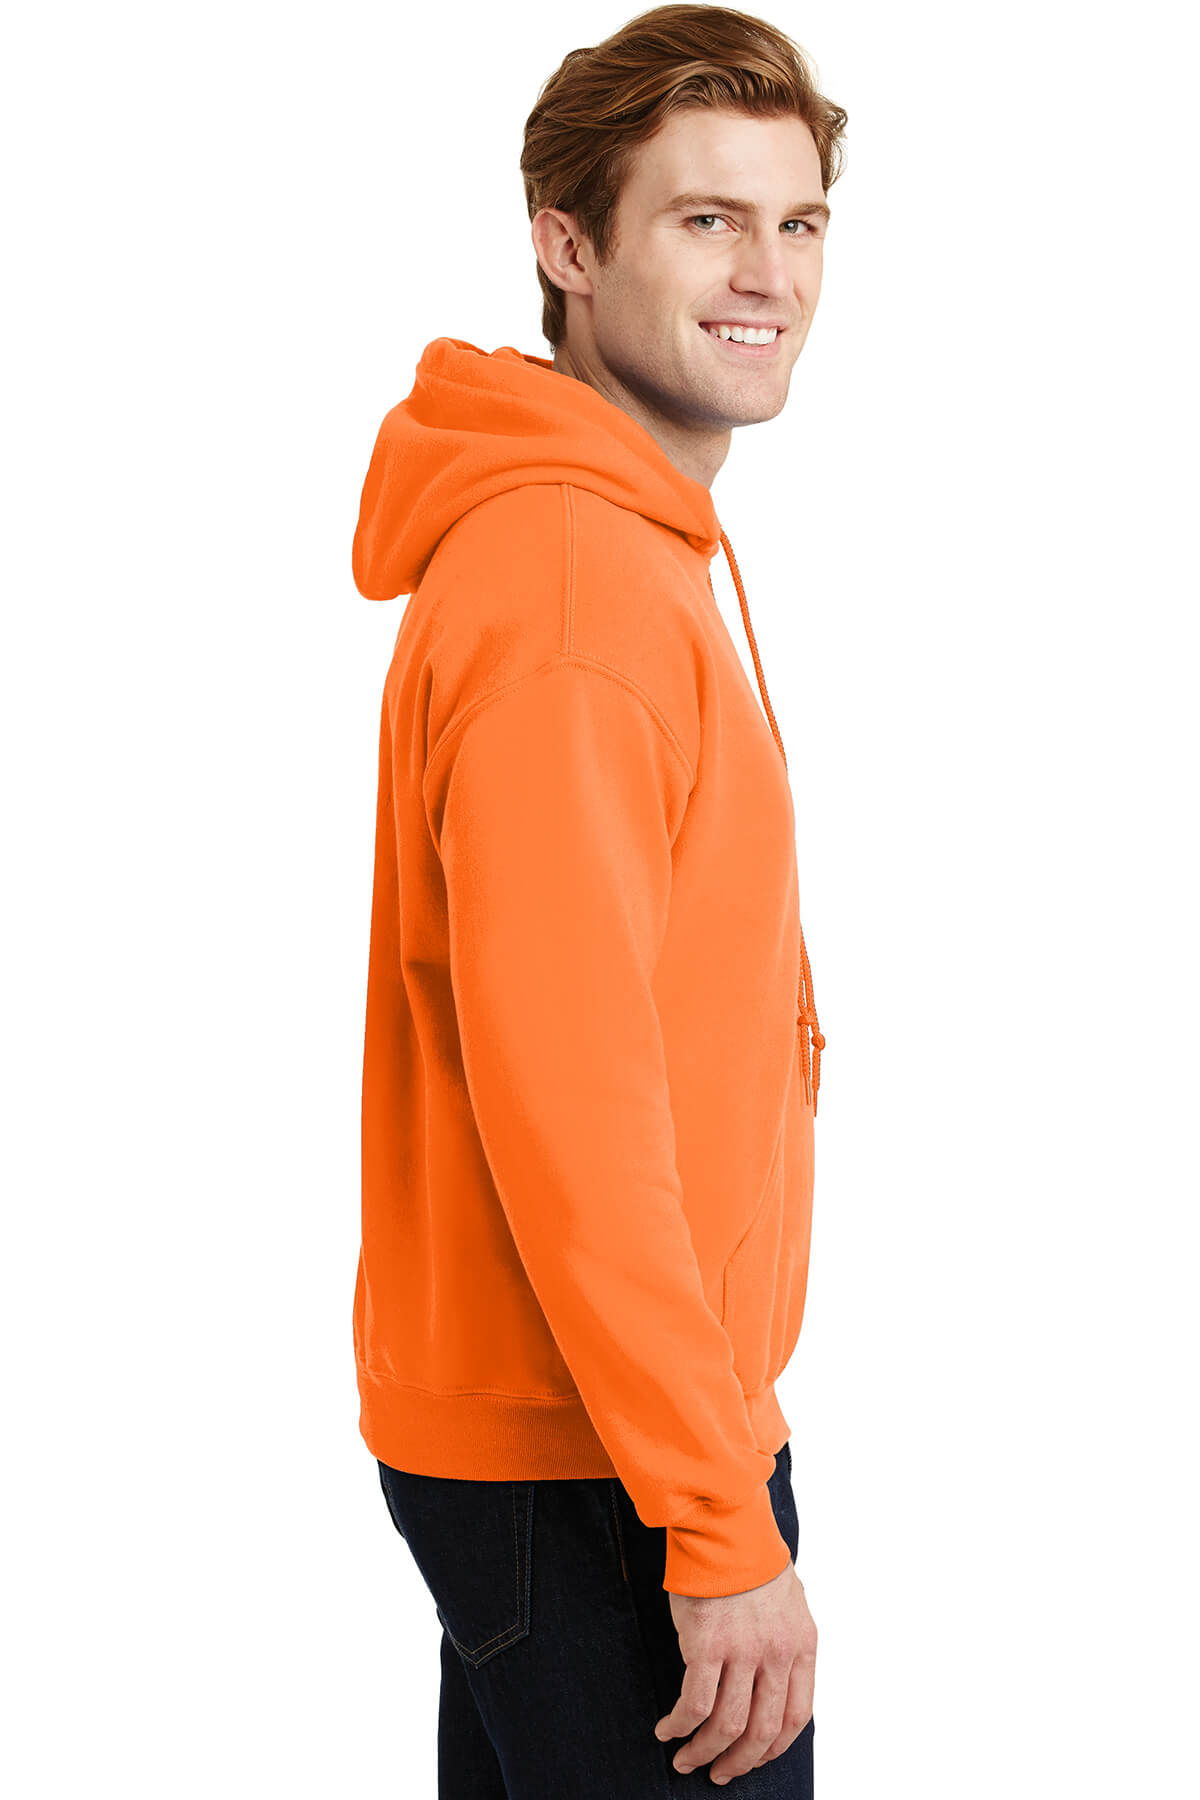 18500-southern-orange-3